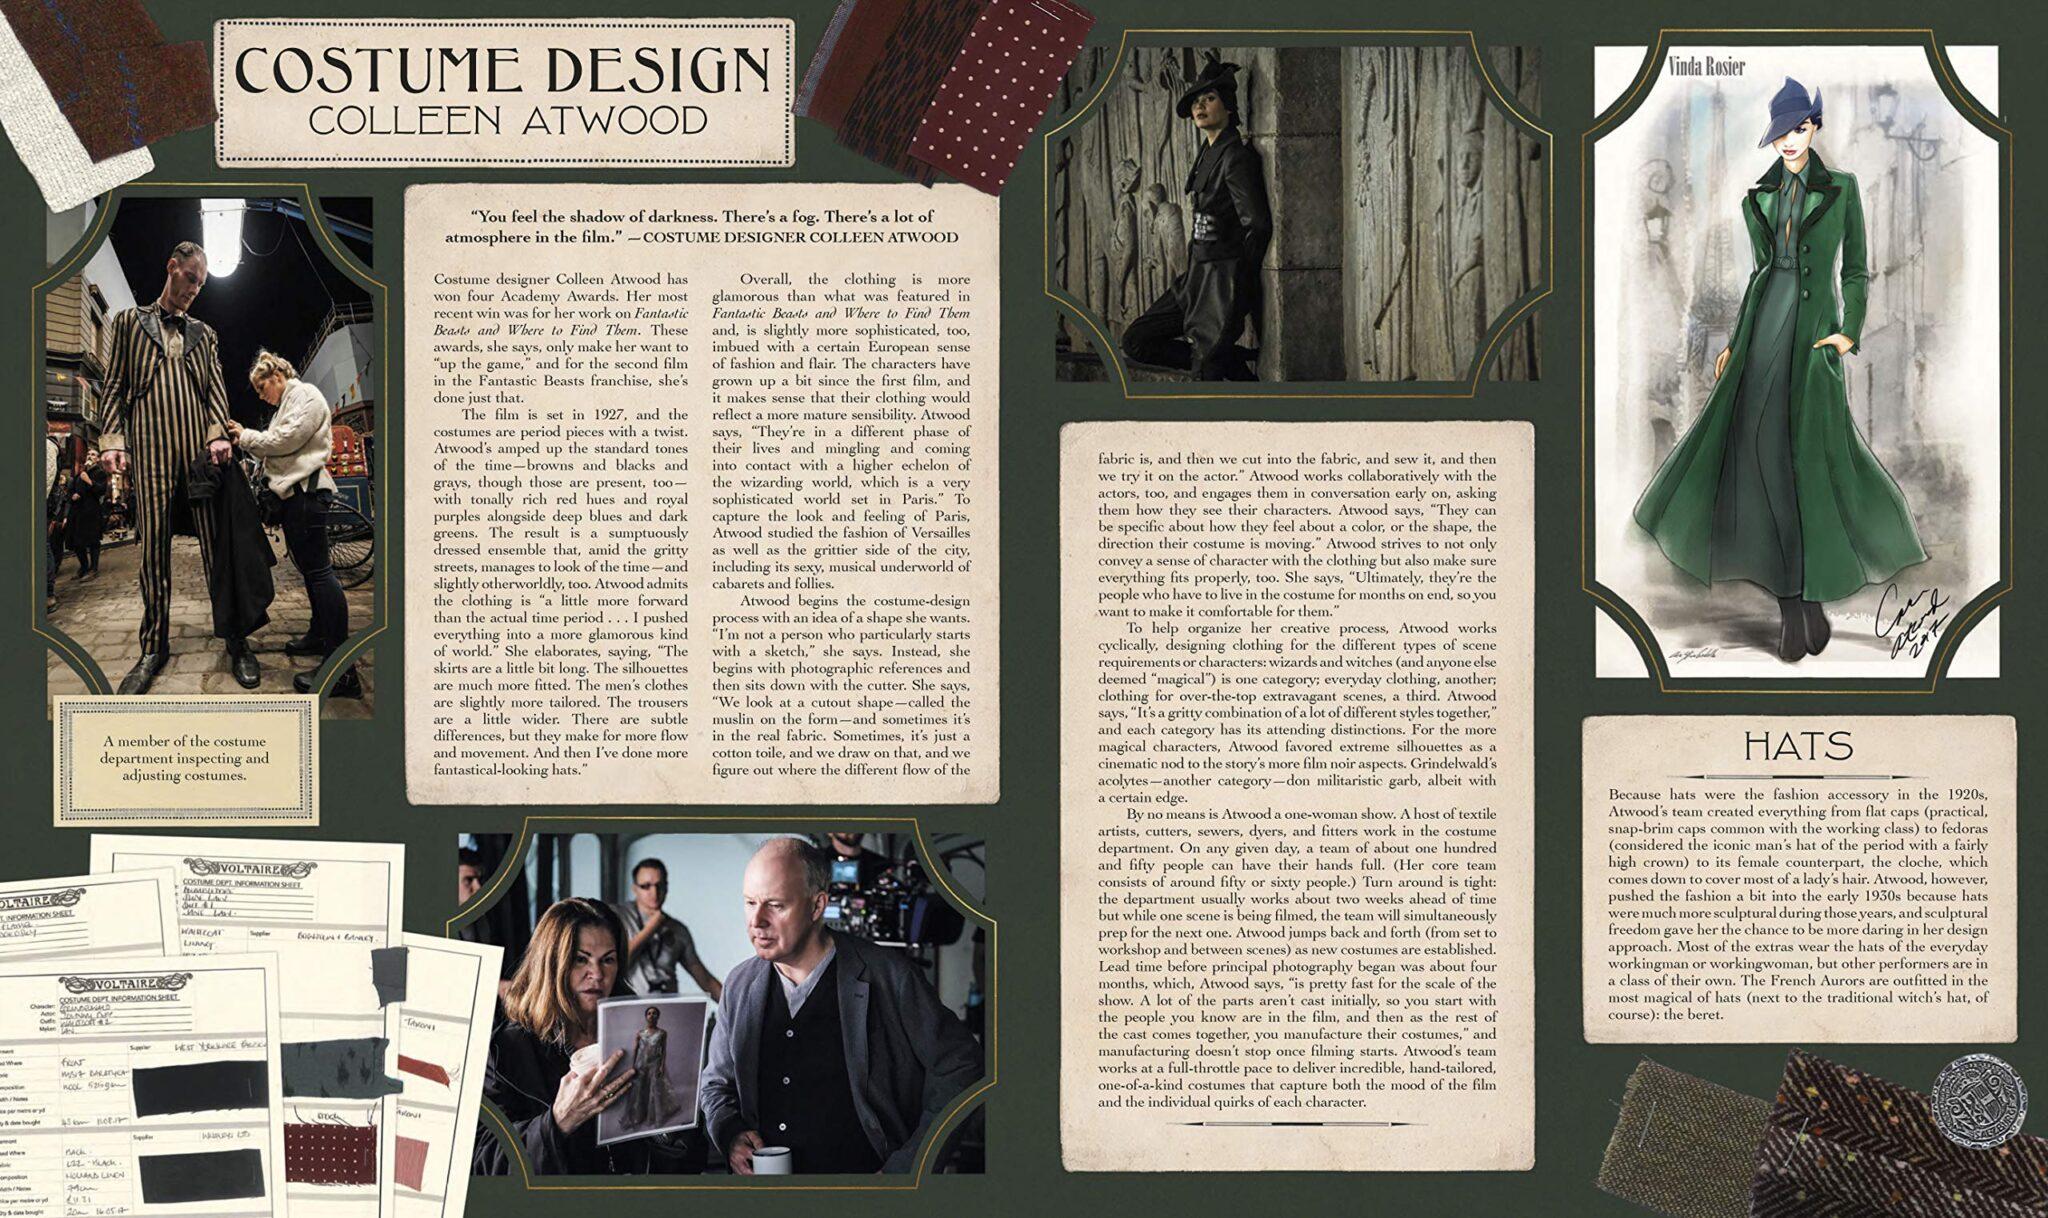 the archive of magic costume design